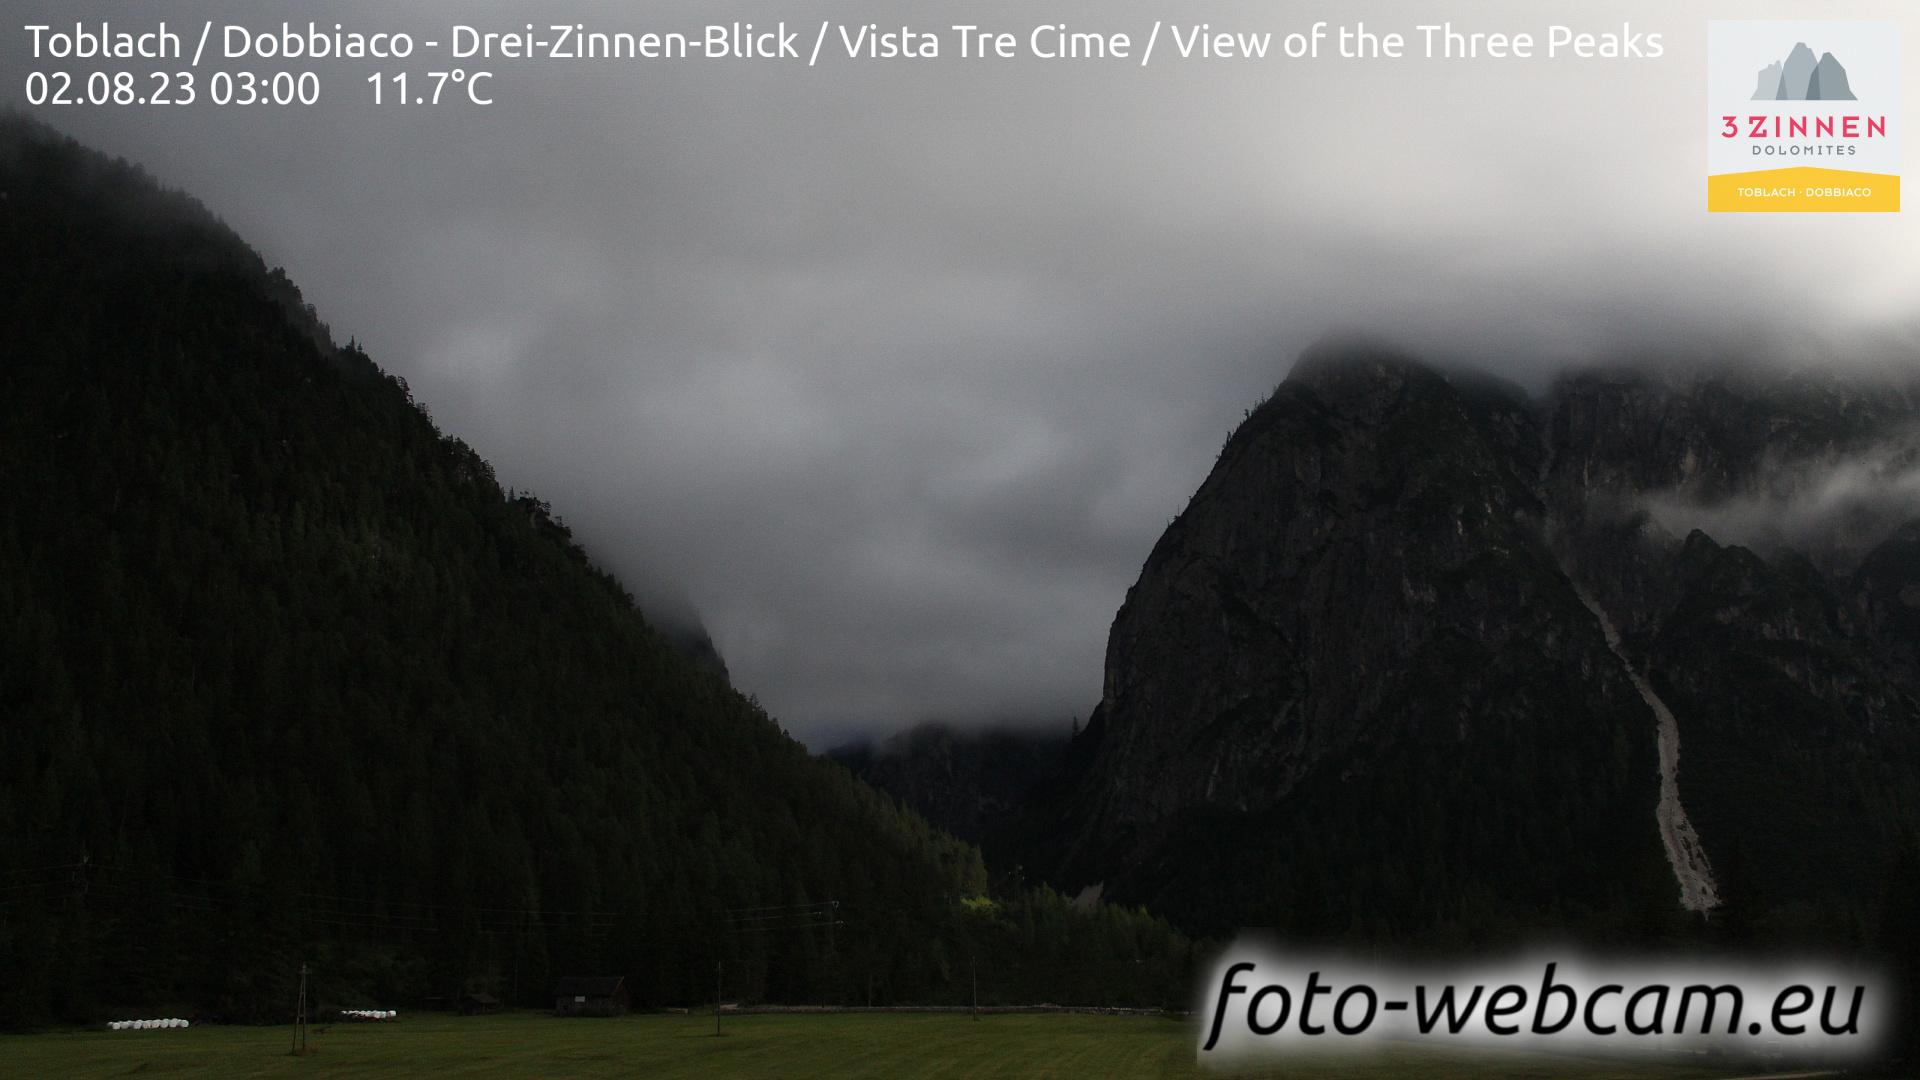 Toblach (Dolomites) Tue. 03:27